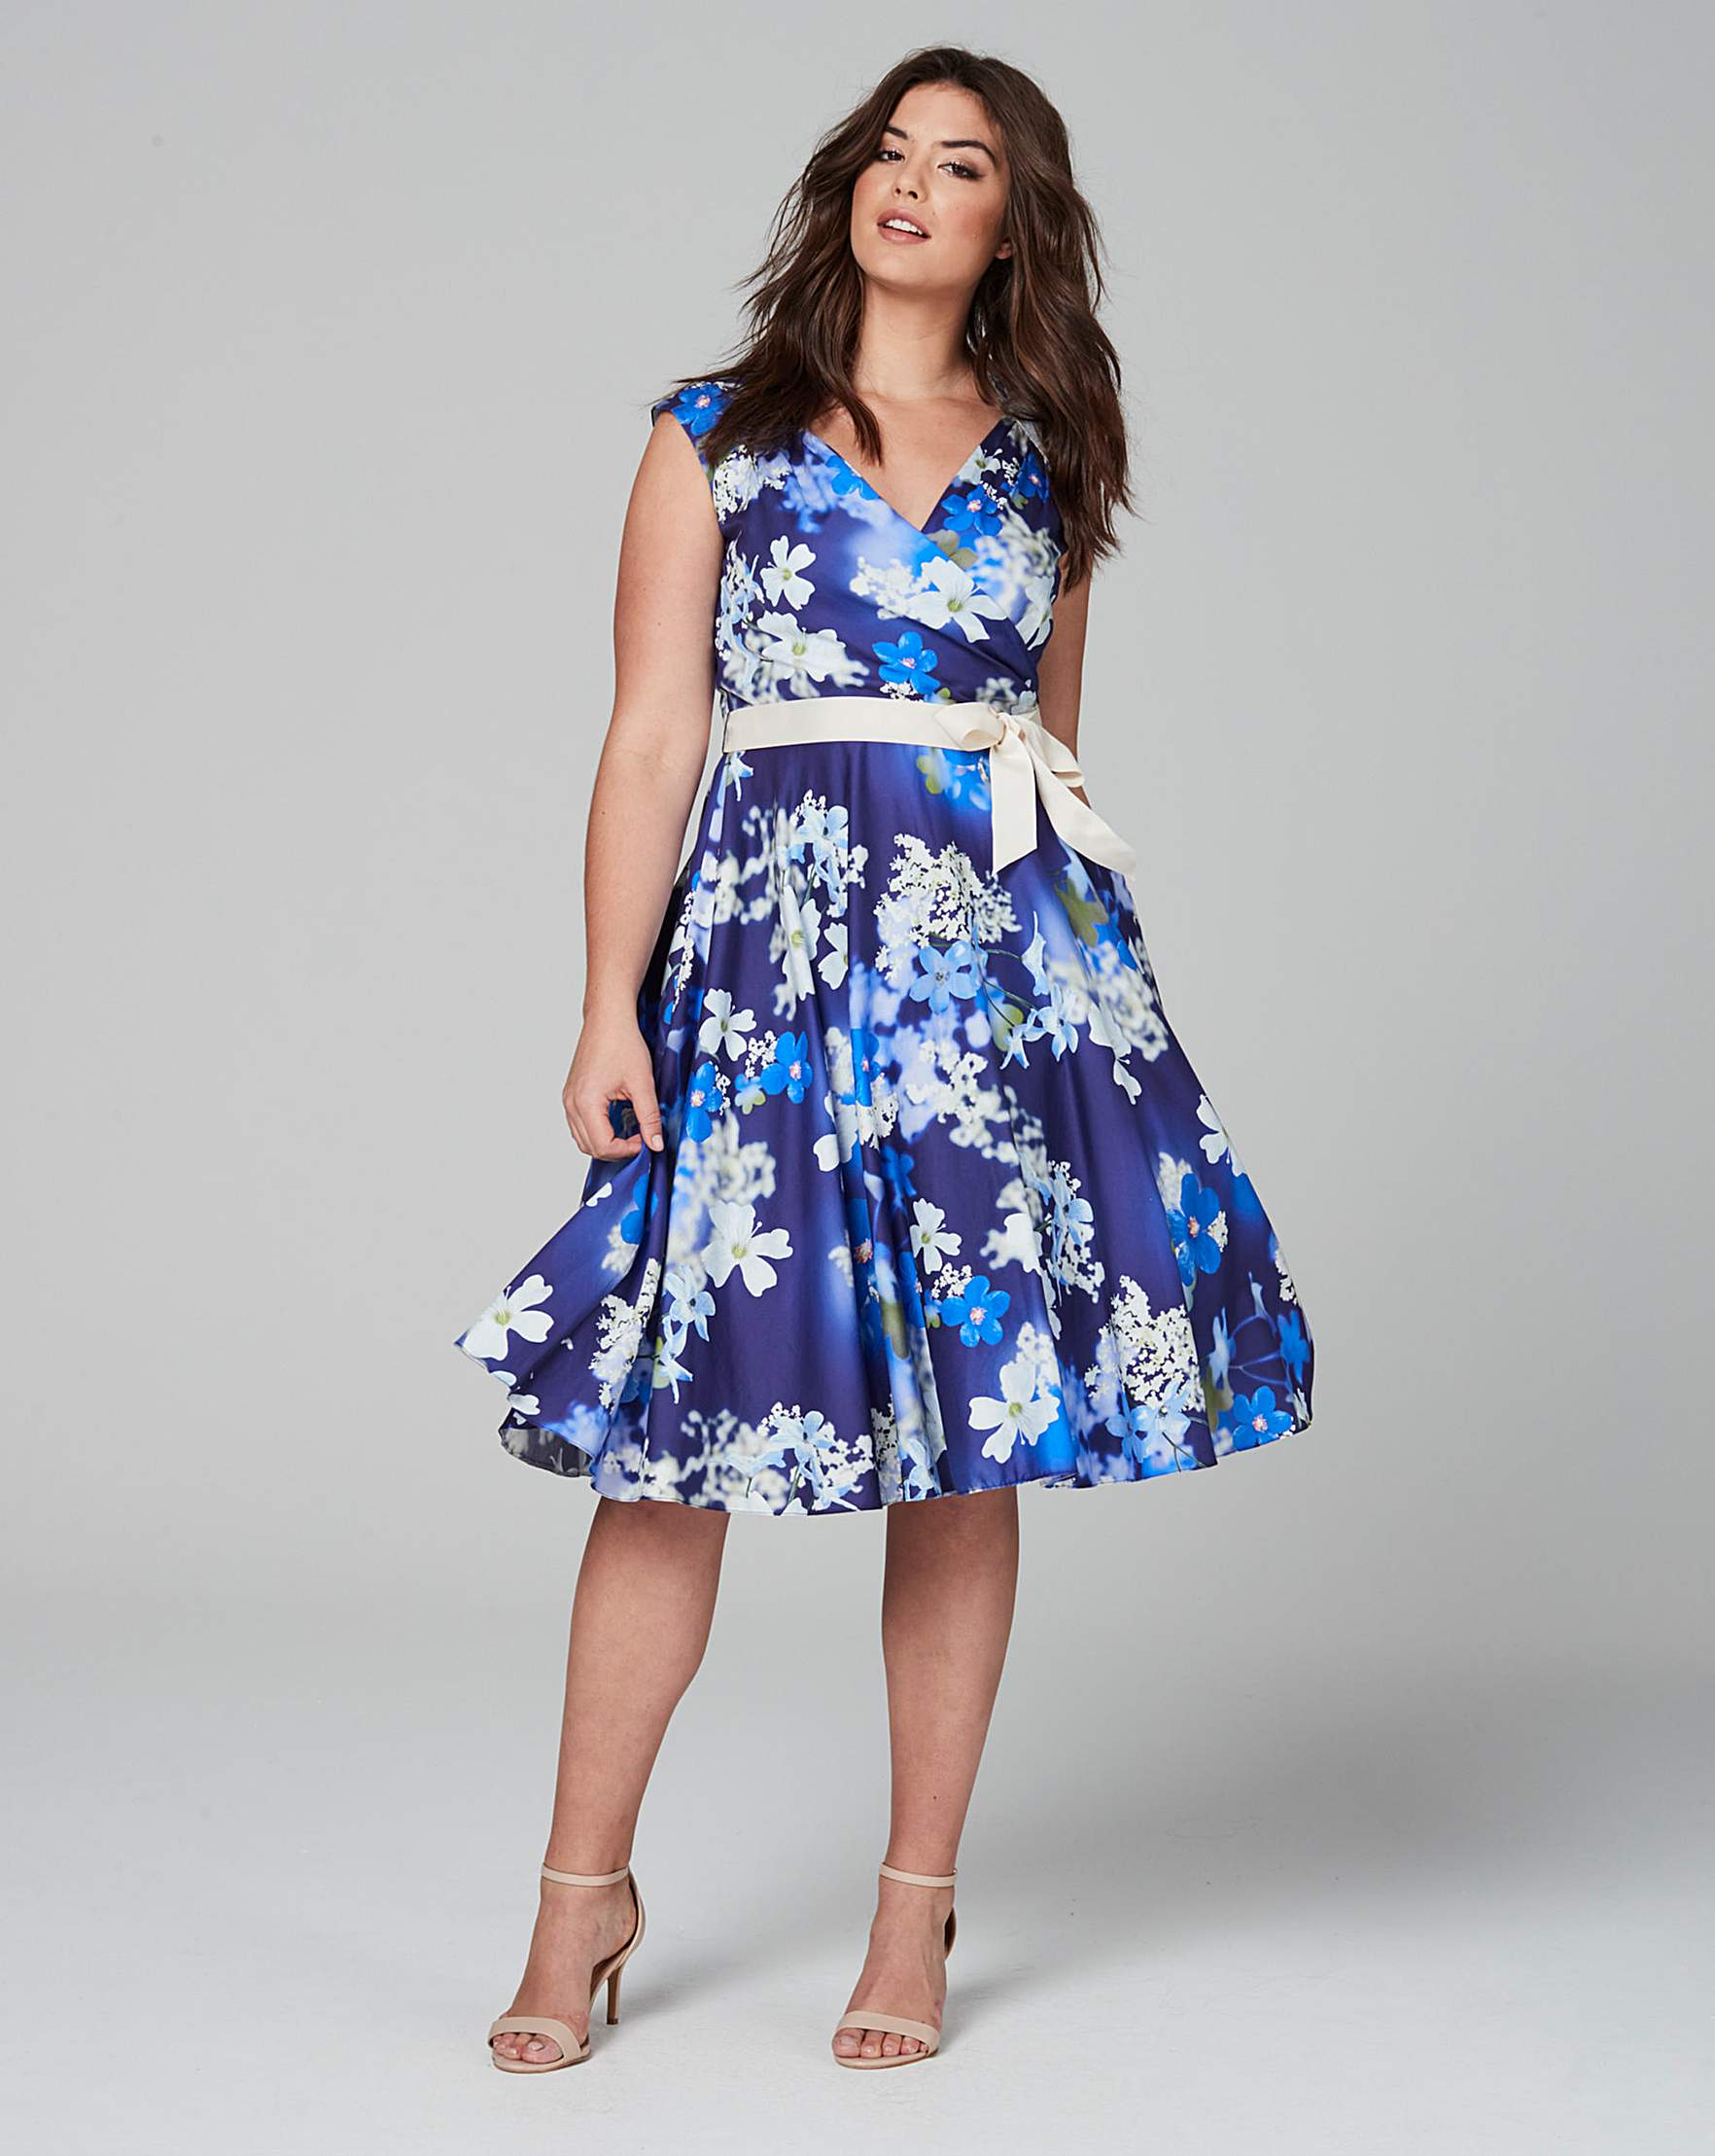 Studio 8 By Phase 8 Charlene Dress